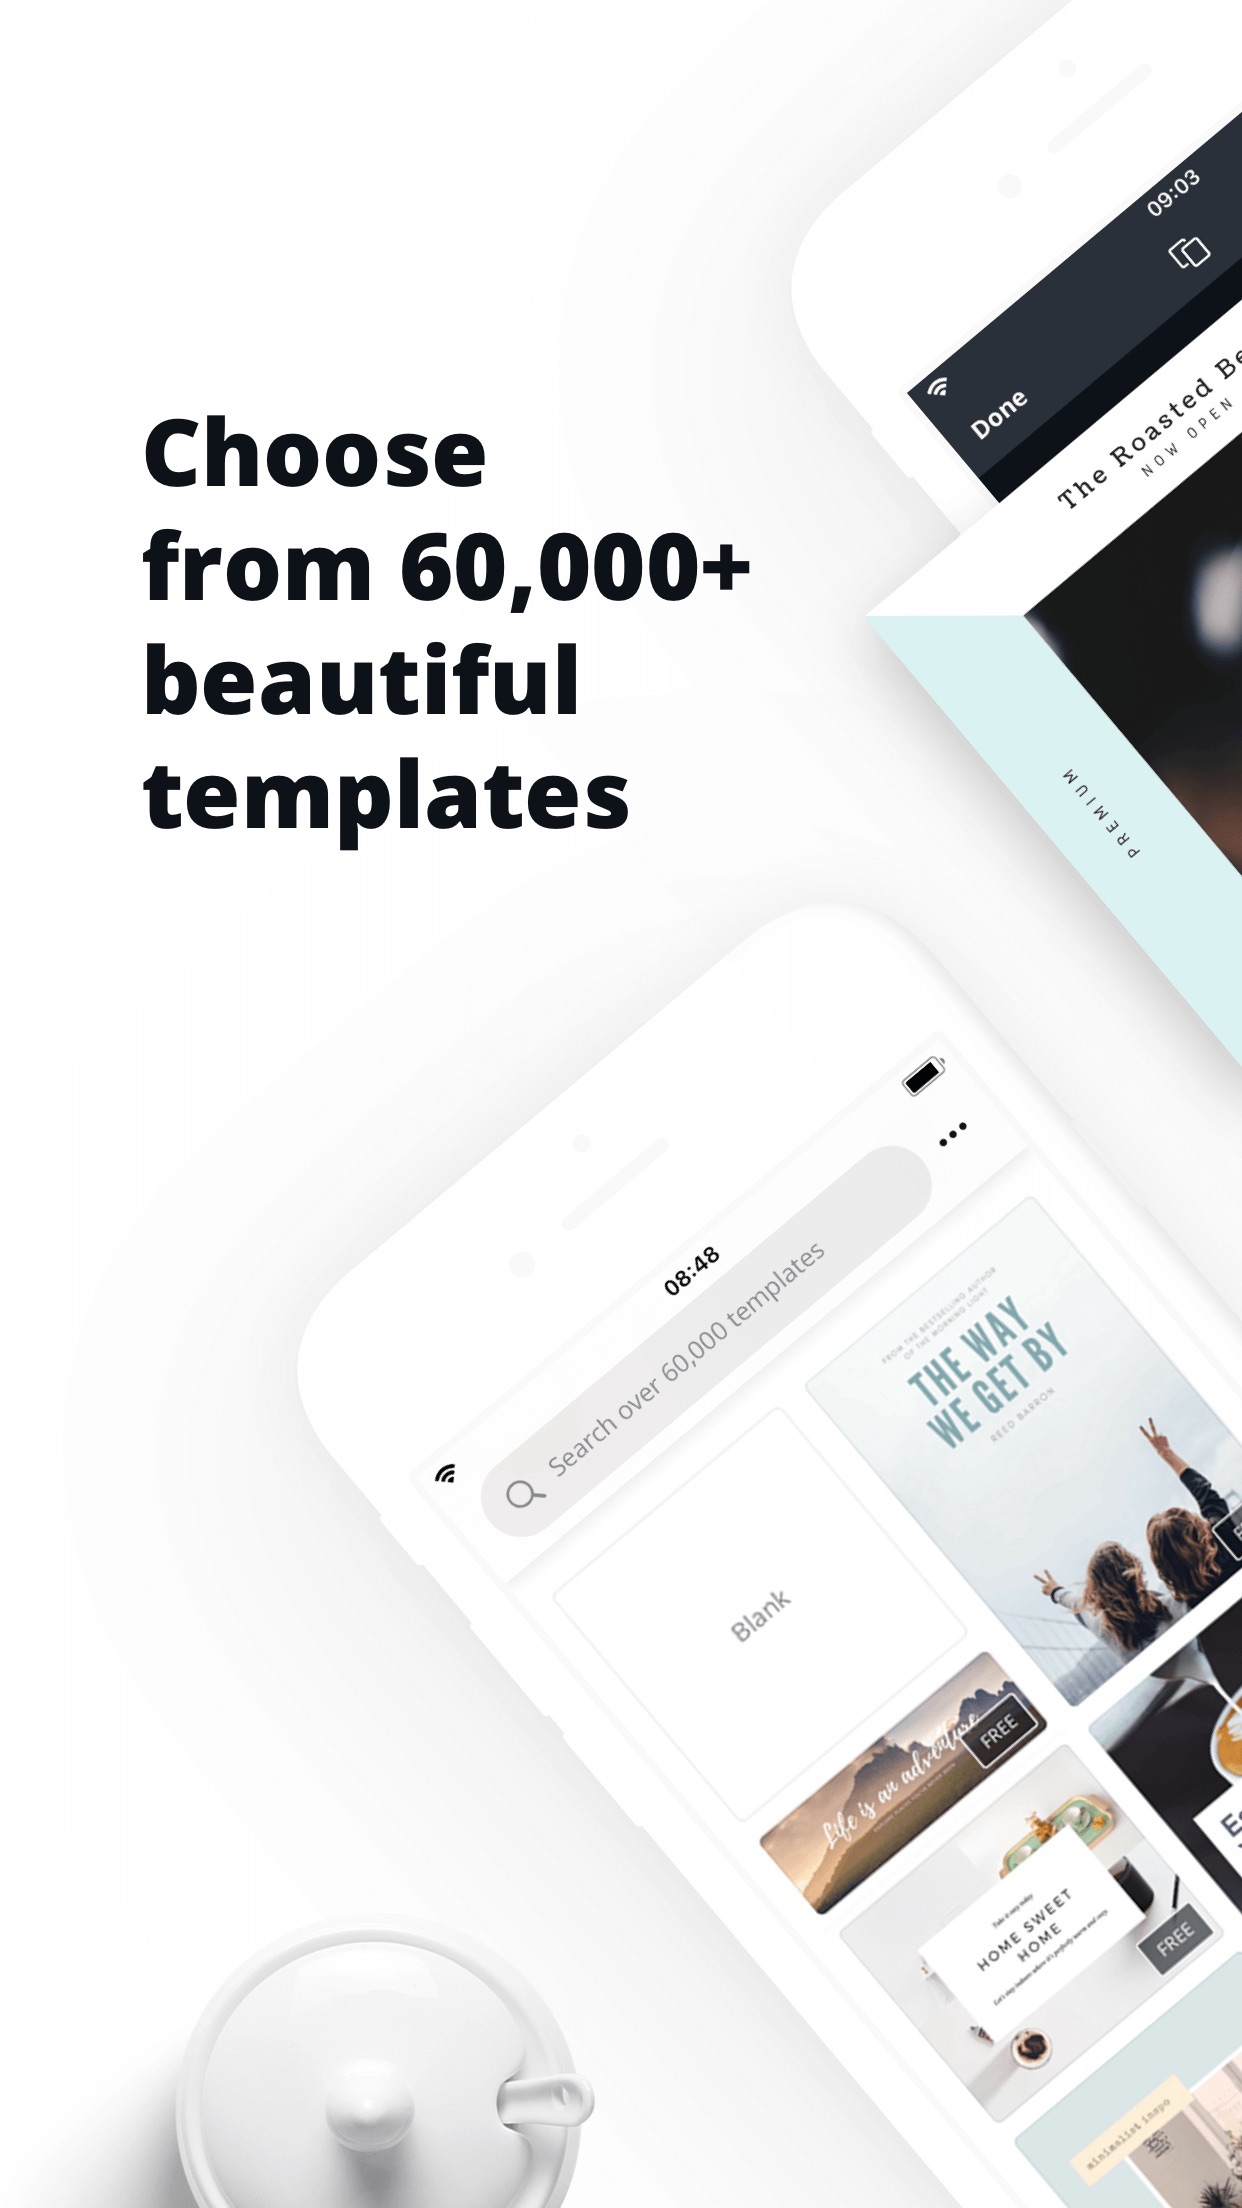 Canva: Graphic Design & Video Screenshot